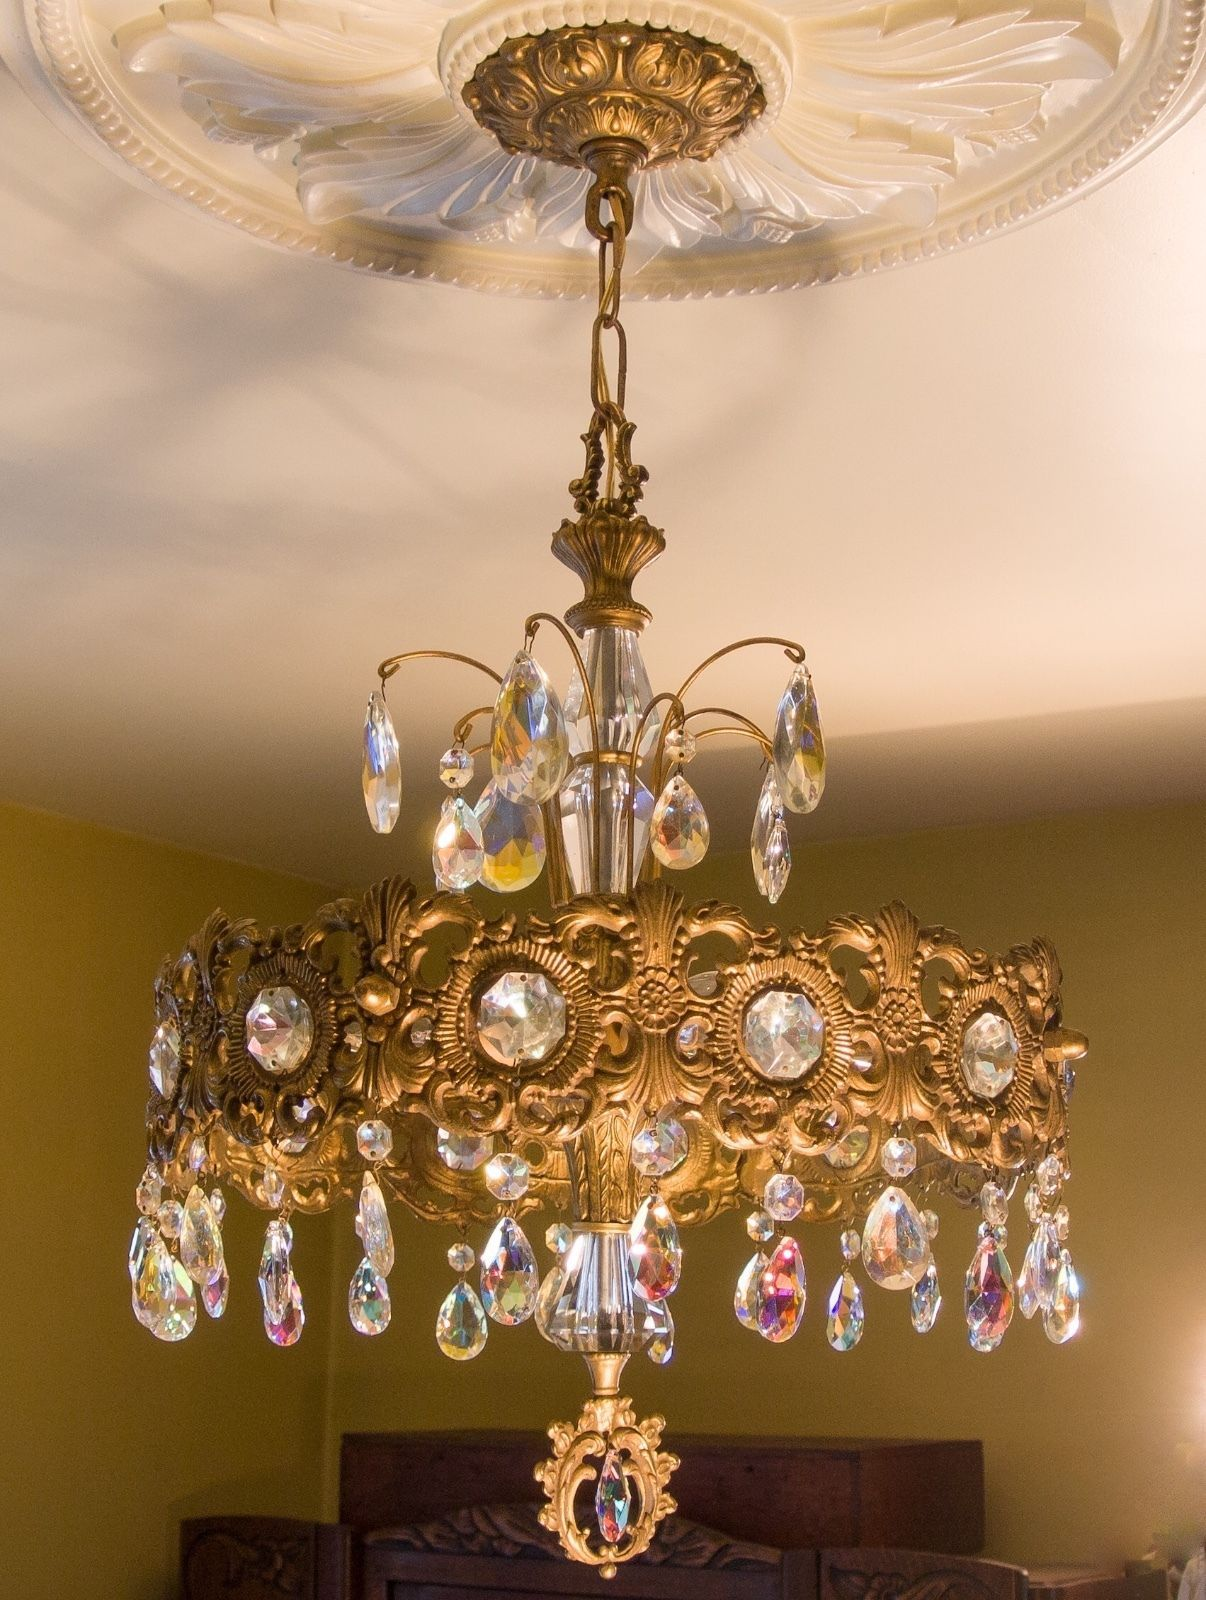 Mid century 4 lt vintage chandelier stunning irredescent crystal mid century 4 lt vintage chandelier stunning irredescent crystal prisms ebay mozeypictures Images